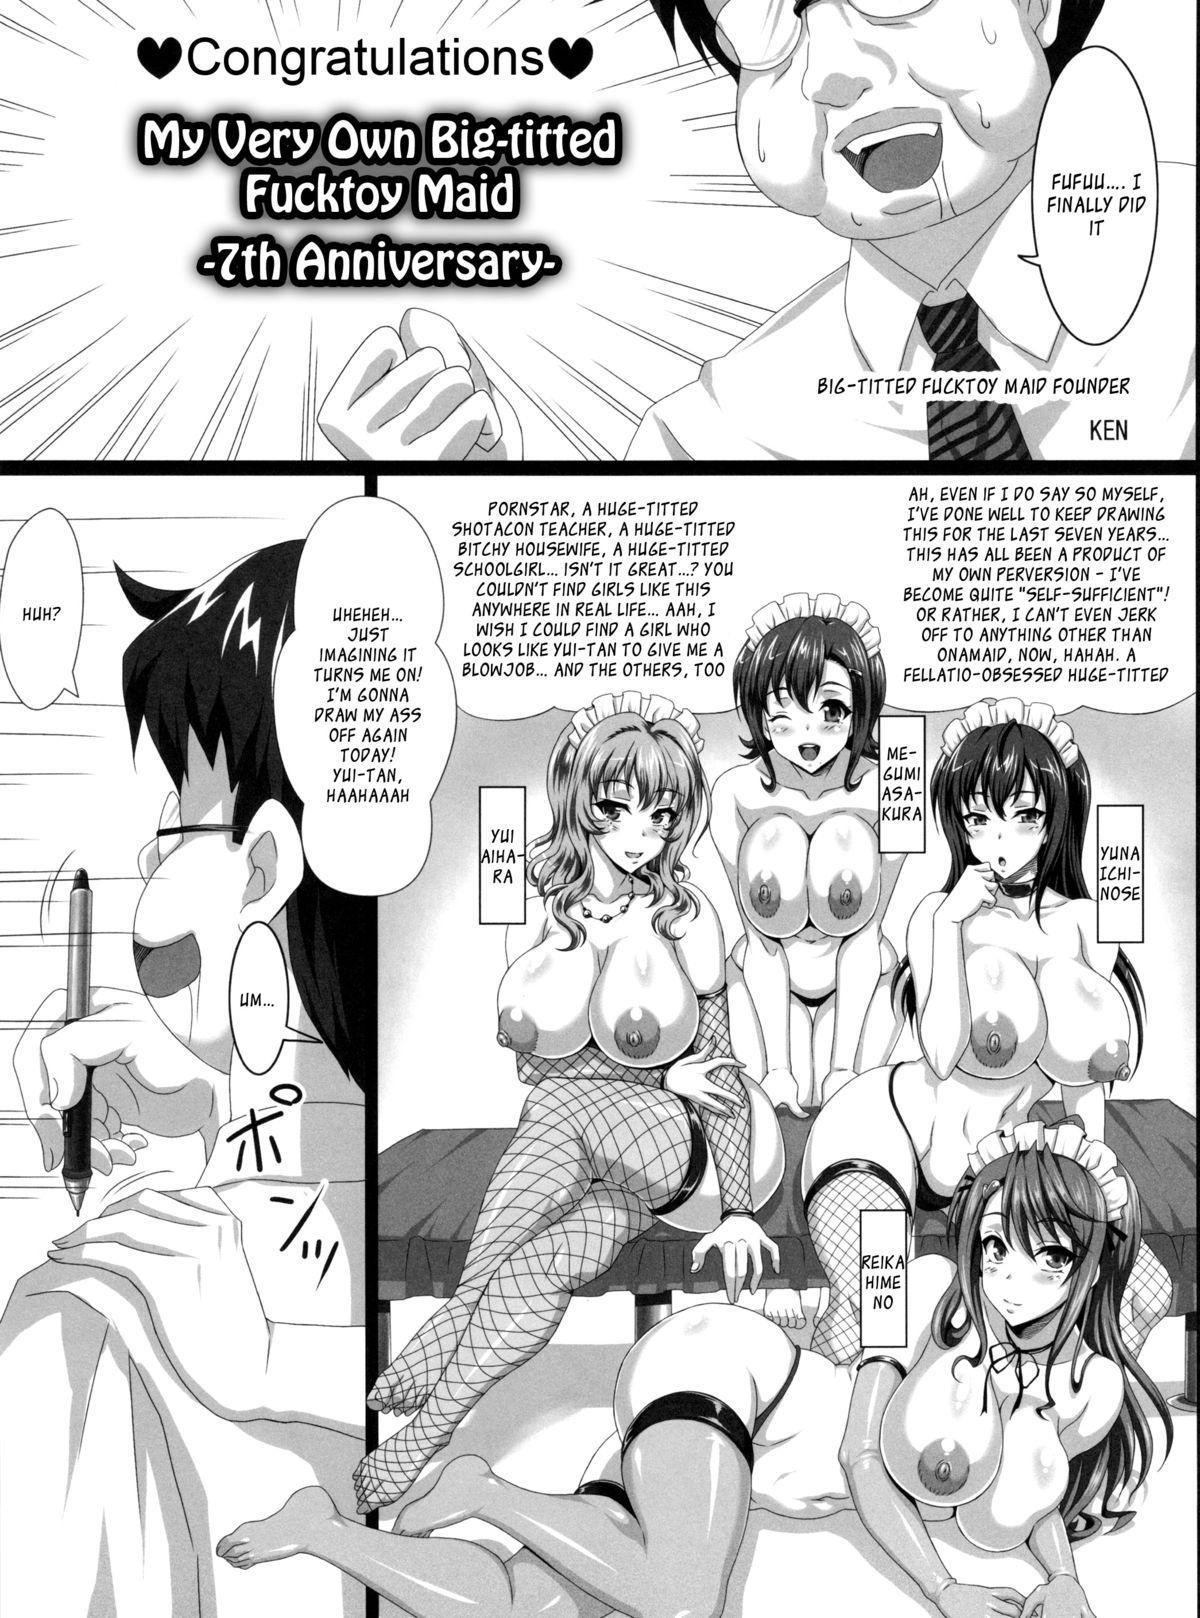 (COMIC1☆7) [KEN] Boku dake no Bakunyuu Onamaid -7 Shuunen- | My Very Own Big Titted Fucktoy Maid -7th Anniversay- (Boku Dake no Bakunyuu Onamaid -7 Shuunen Kinen Goudoushi-) [English] 6